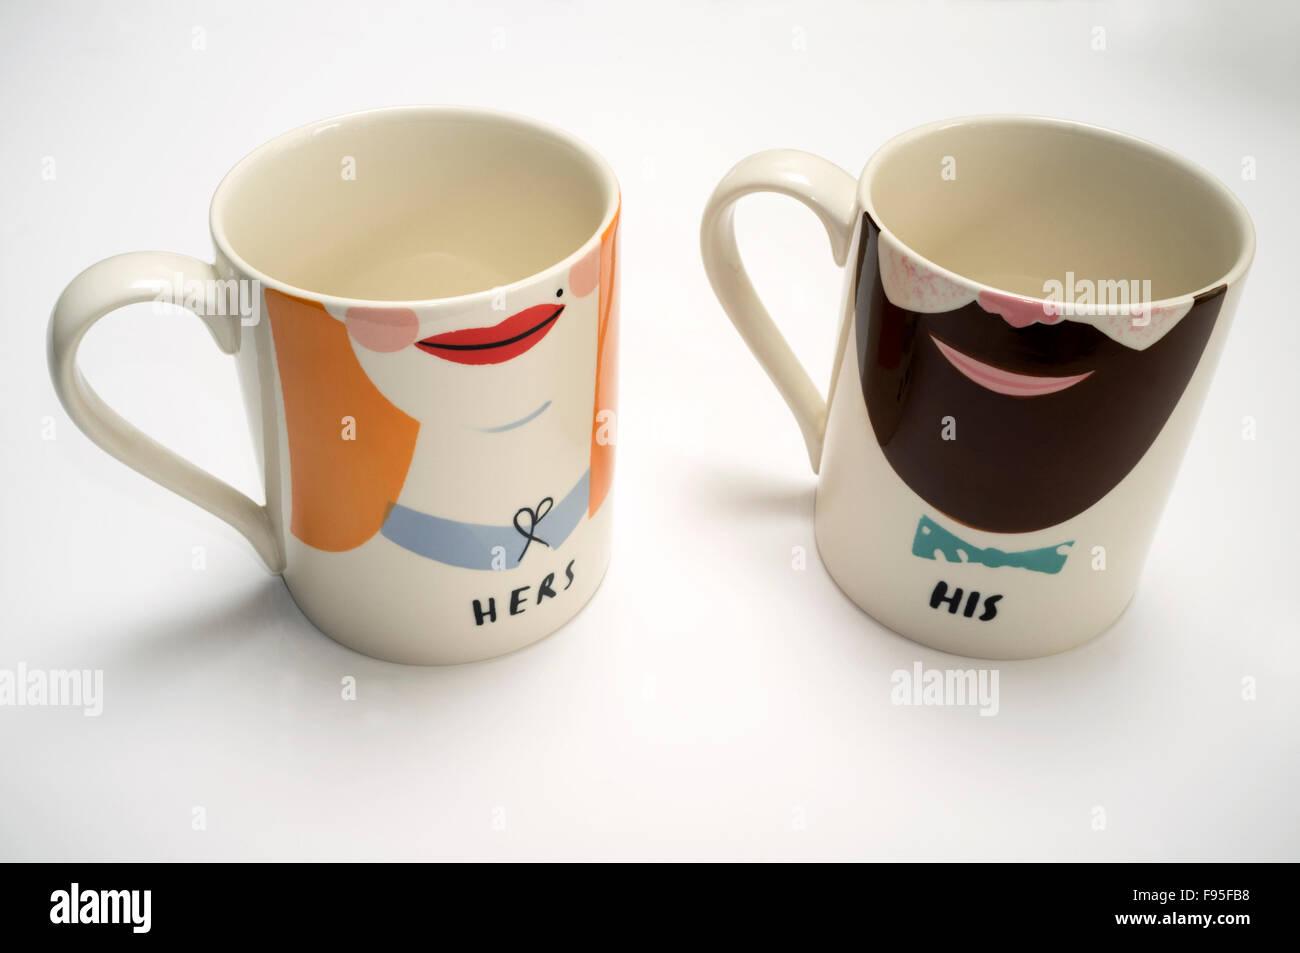 Hers & His mugs - Stock Image